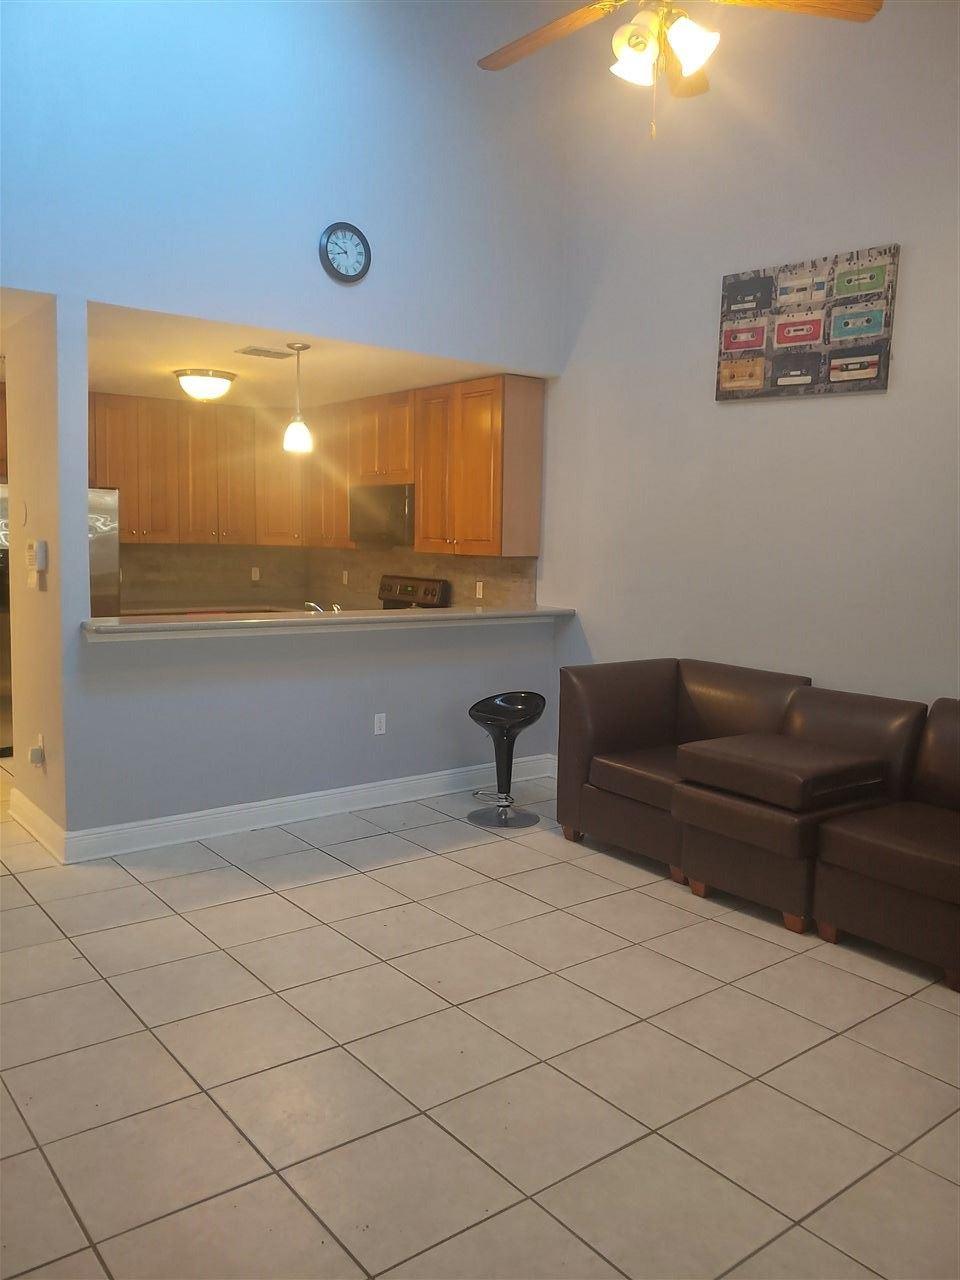 Photo of 3361 SAWTOOTH, TALLAHASSEE, FL 32303 (MLS # 328705)